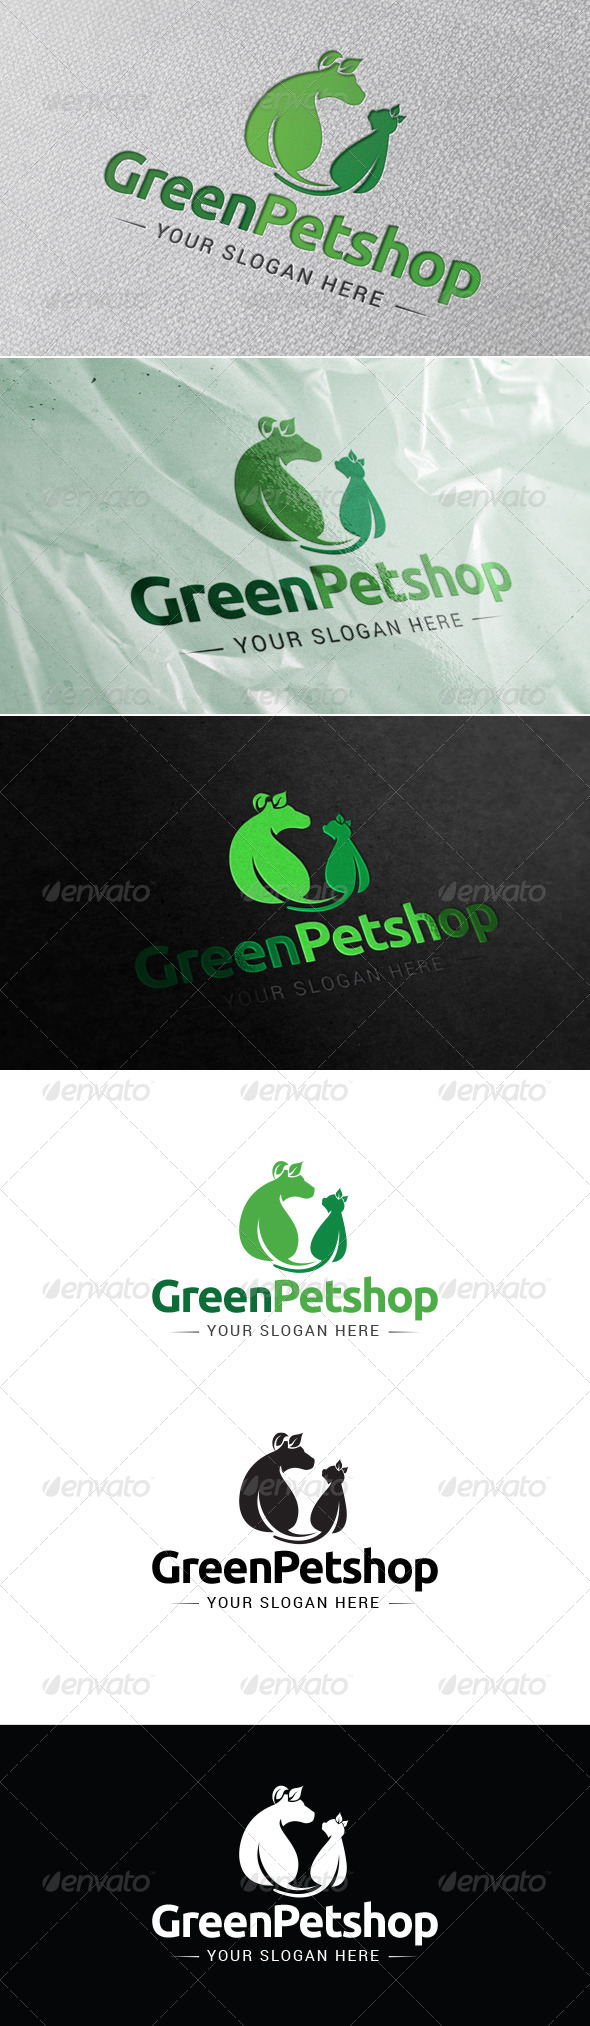 Green Petshop Logo Template - Animals Logo Templates